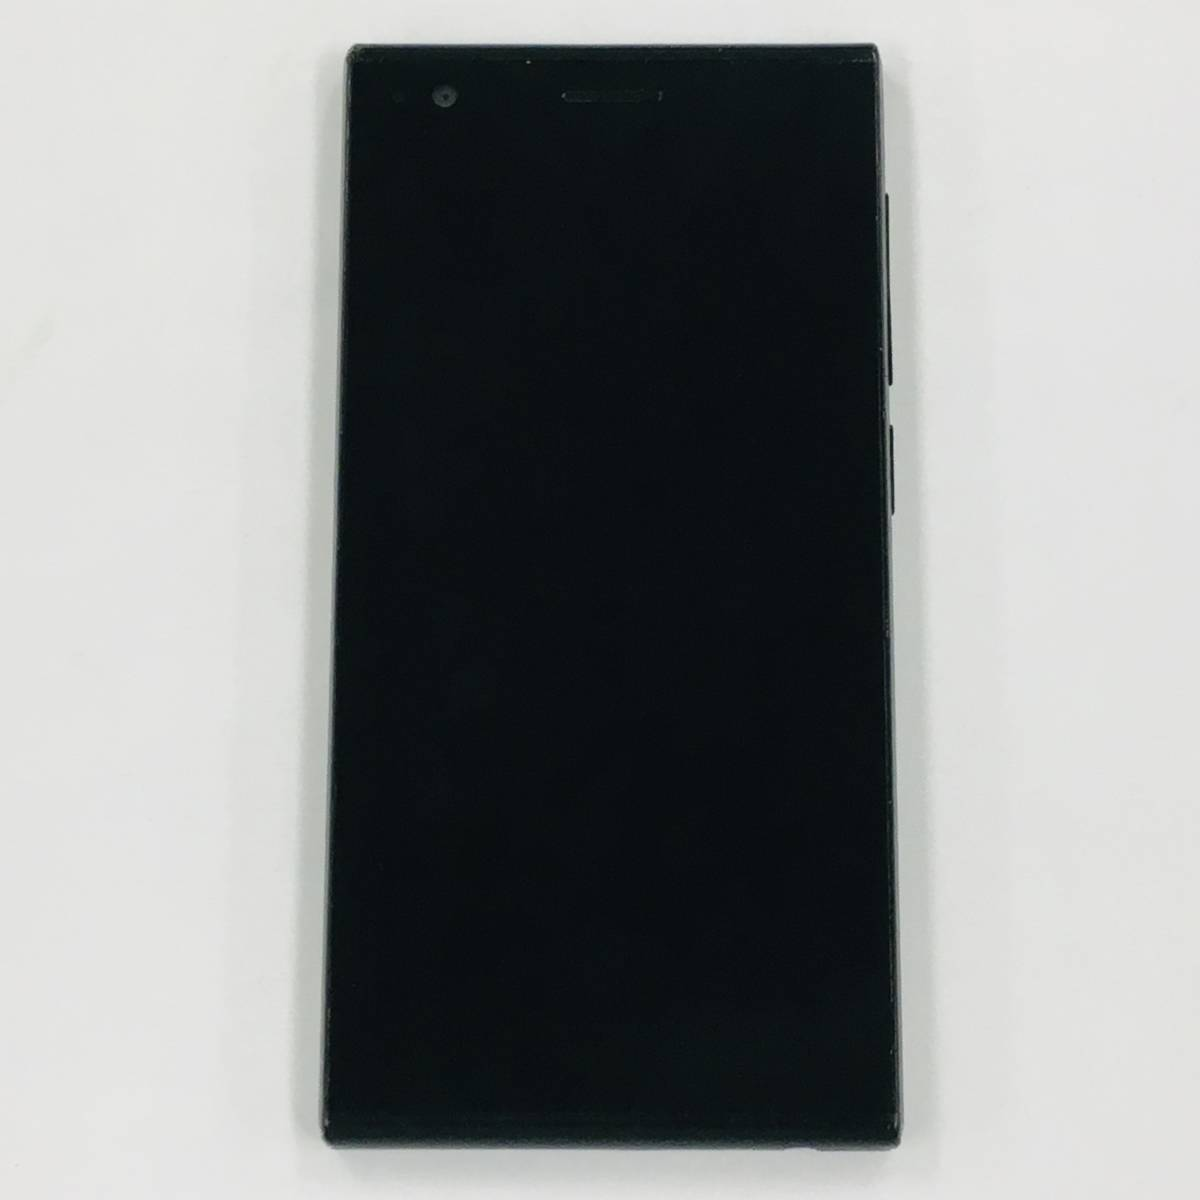 FP050543_(312)【送料無料】ZTE/Blade Vec 4G/ブラック/16GB/Wi-Fi+SIMモデル/SIMフリー/android/スマートフォン/スマホ【中古】_画像4